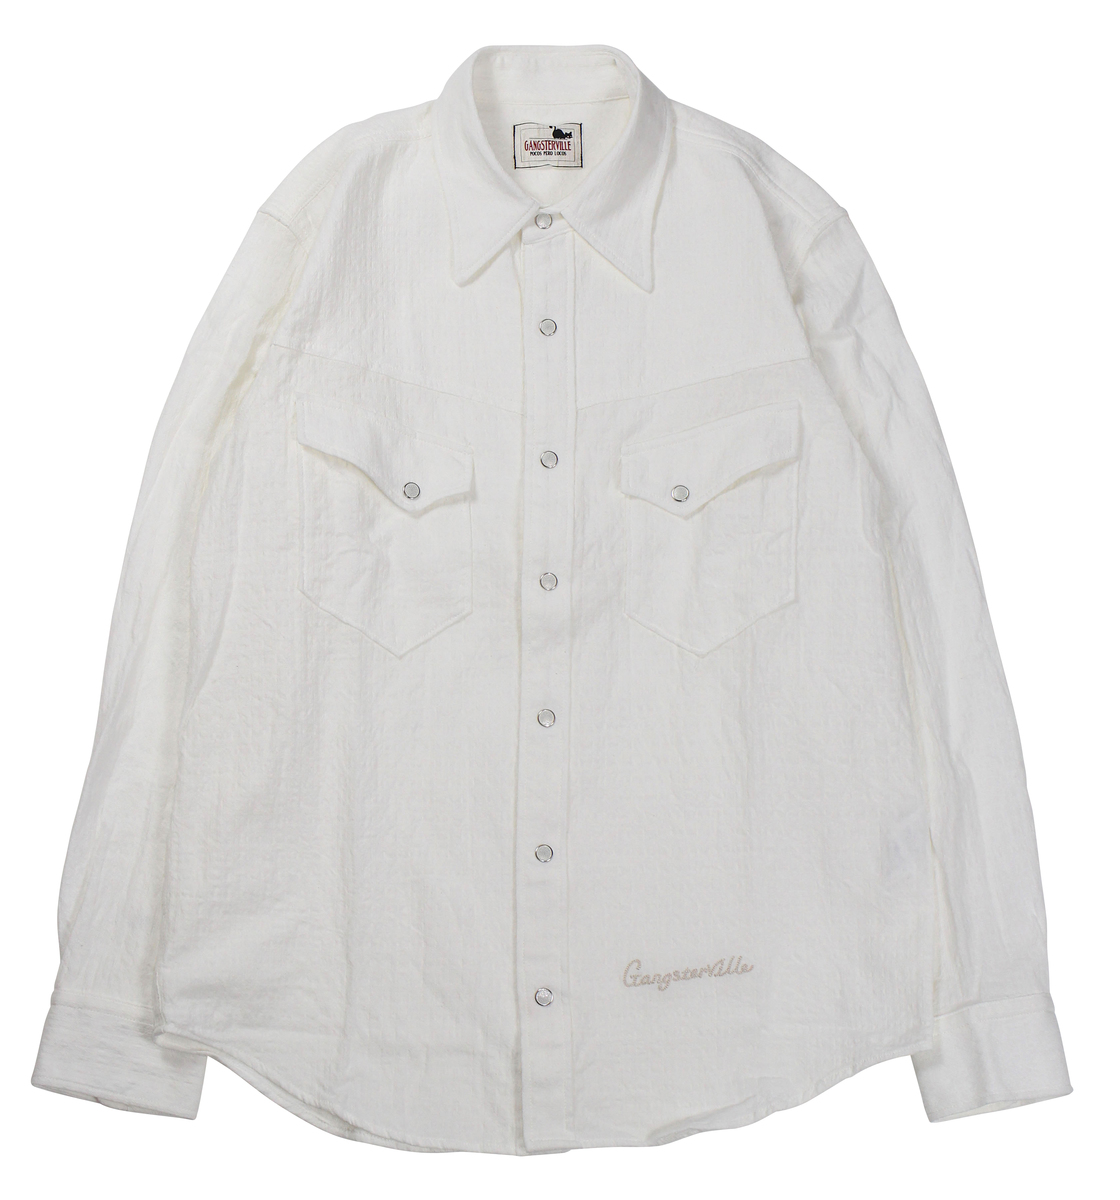 GANGSTERVILLE [-KINGSLAND - L/S SHIRTS- WHITE size.S,M,L,XL]